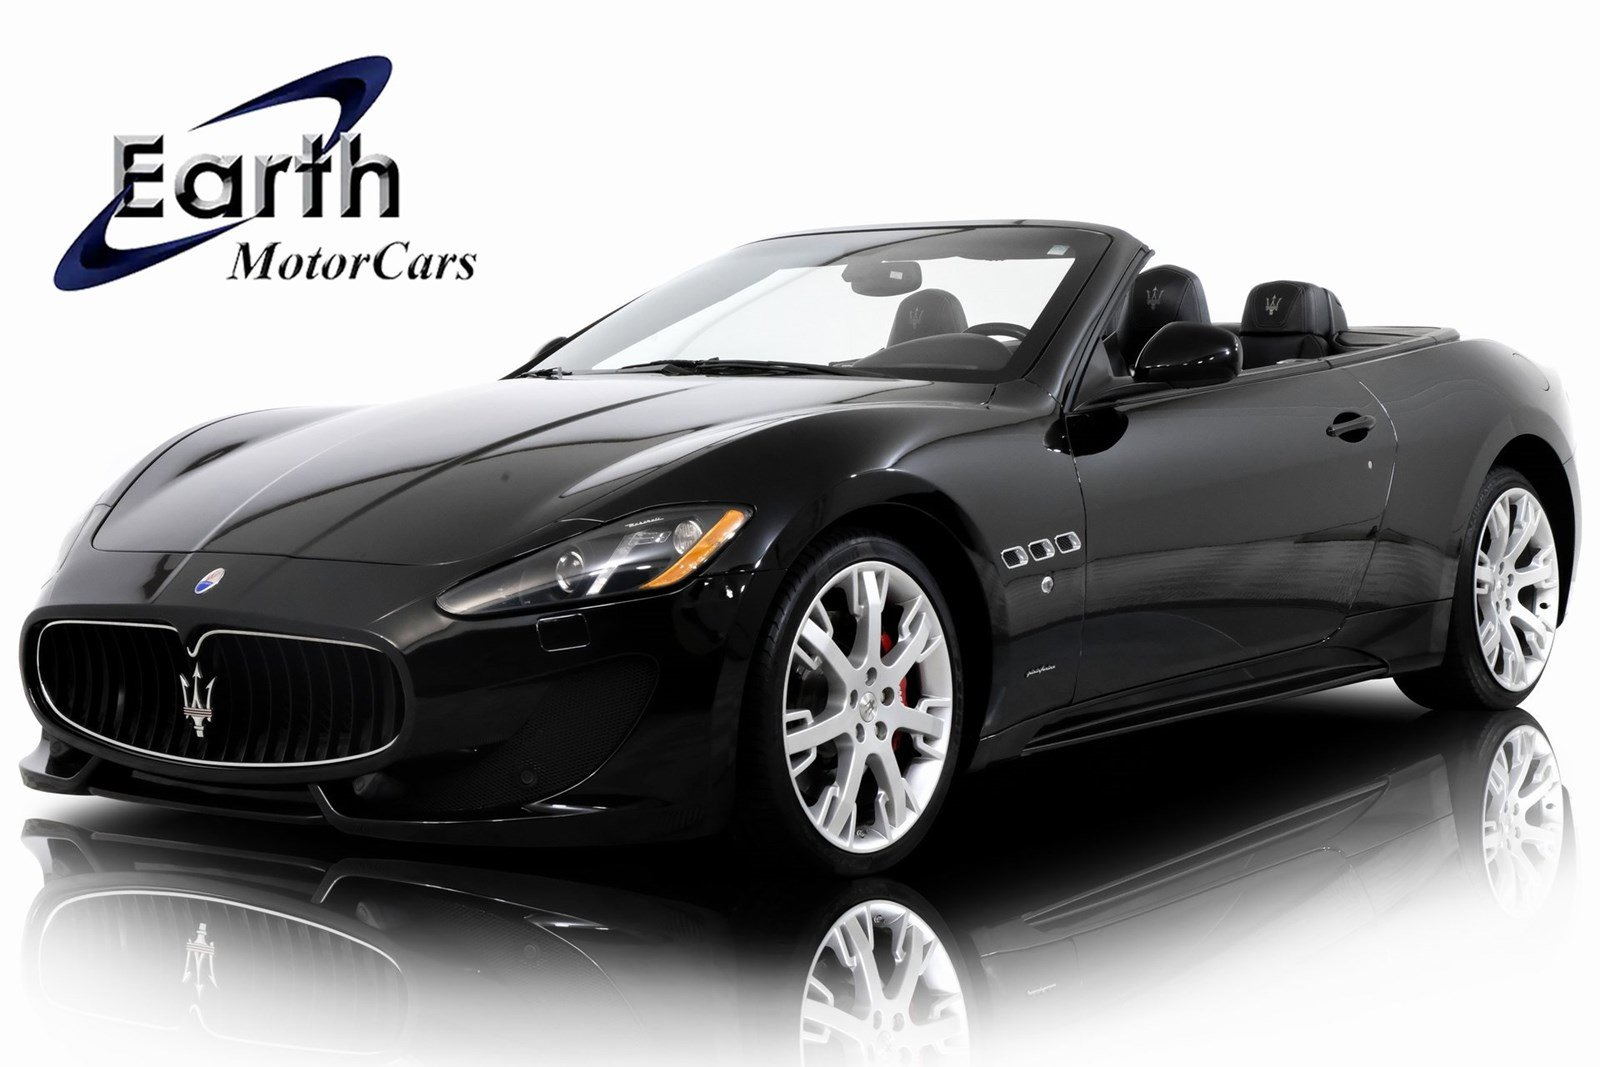 2014 Maserati GranTurismo Sport image